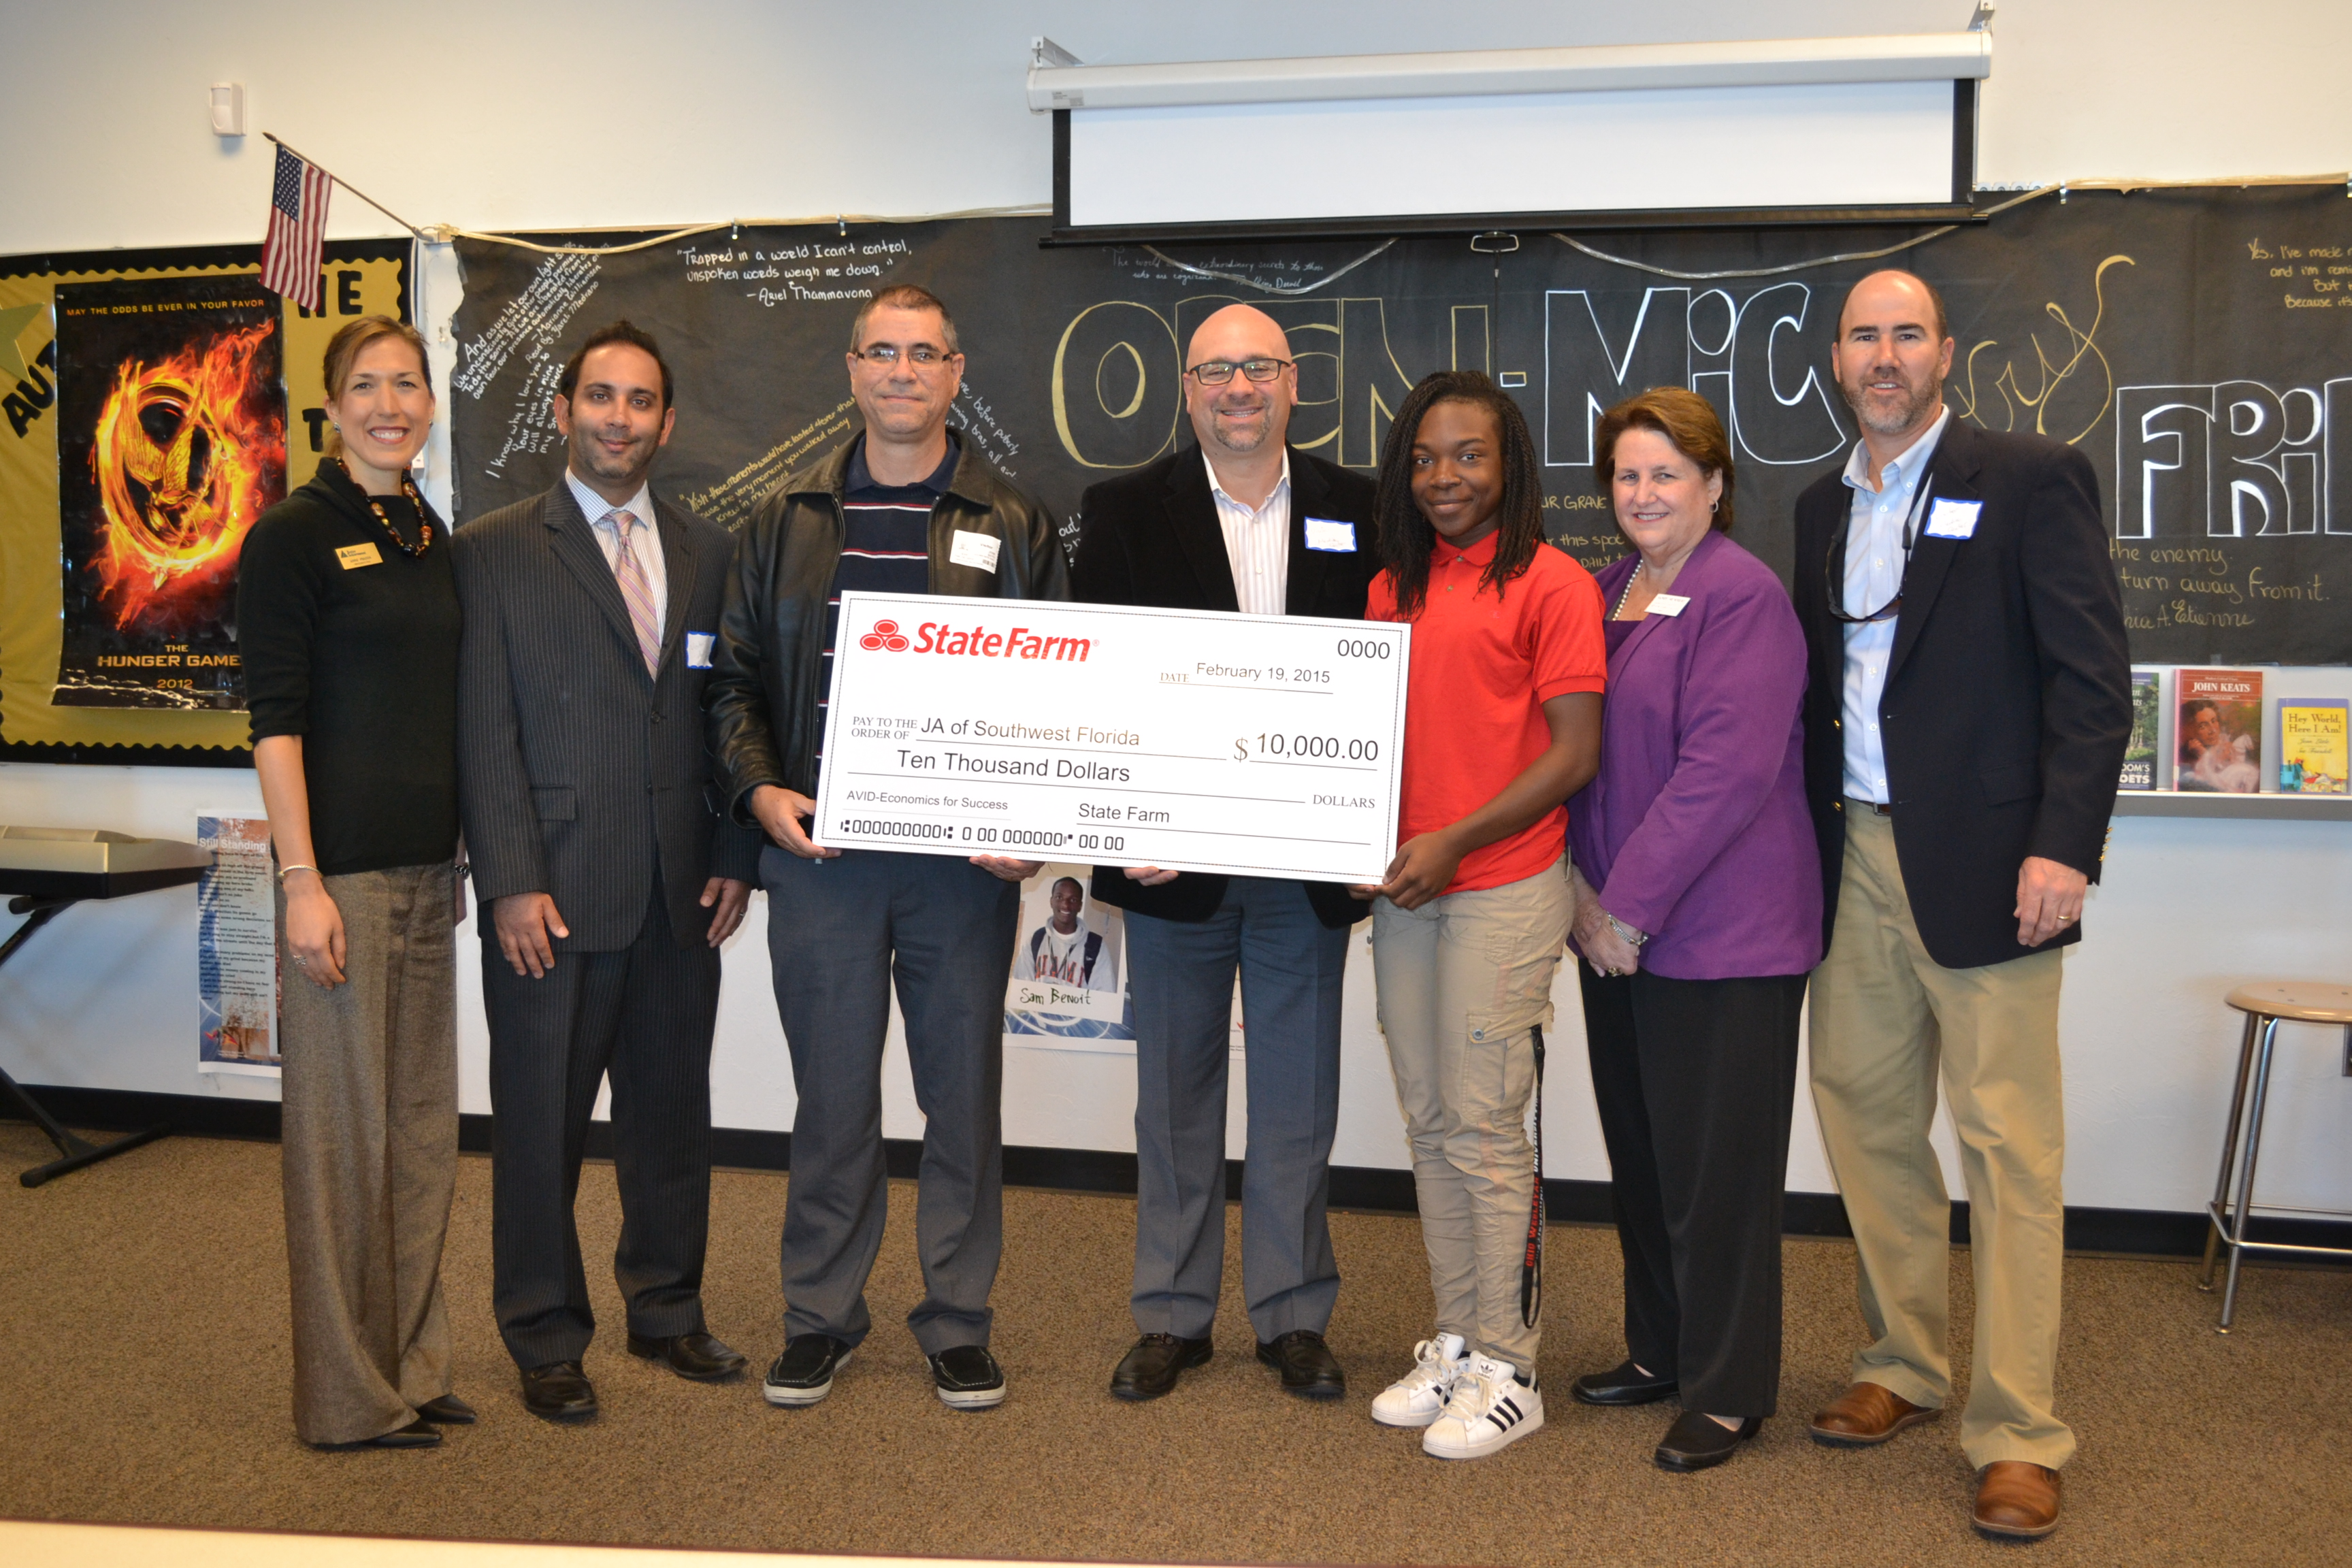 State Farm Grant Supports Junior Achievement Program